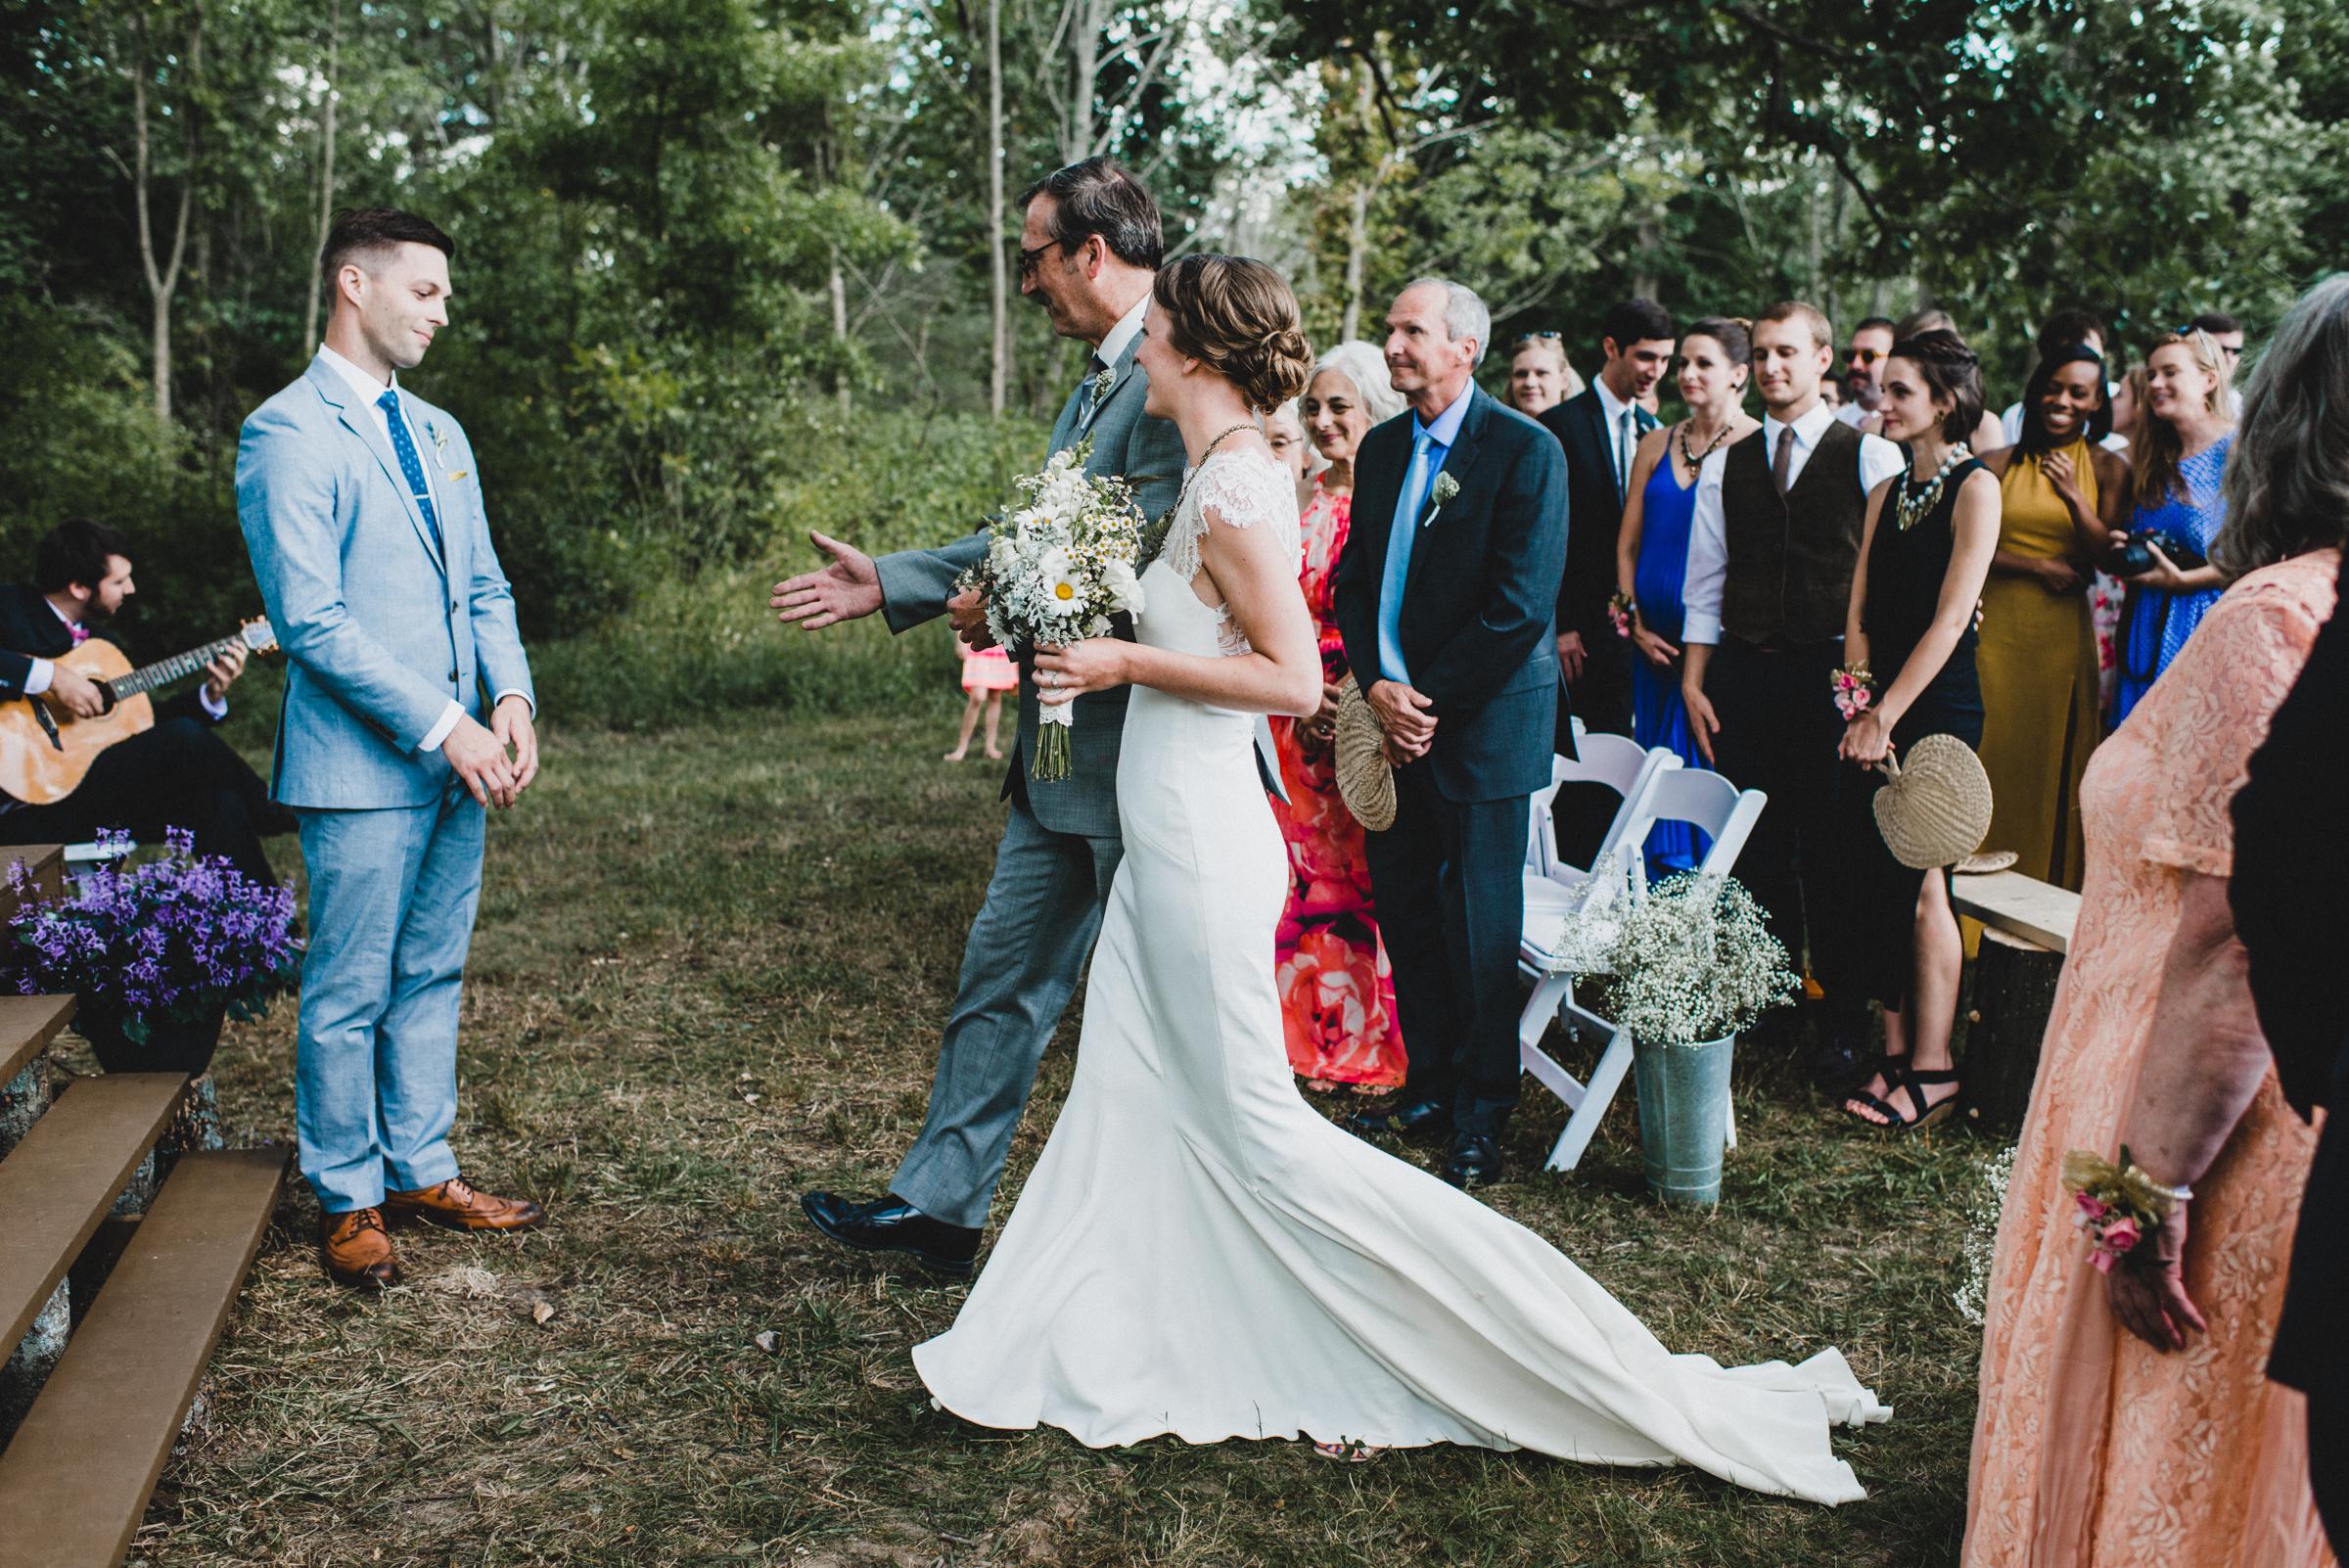 Intimate-Backyard-Farmhouse-Ohio-Wedding-Andi+Ben_Mallory+Justin-Photographers-154.JPG